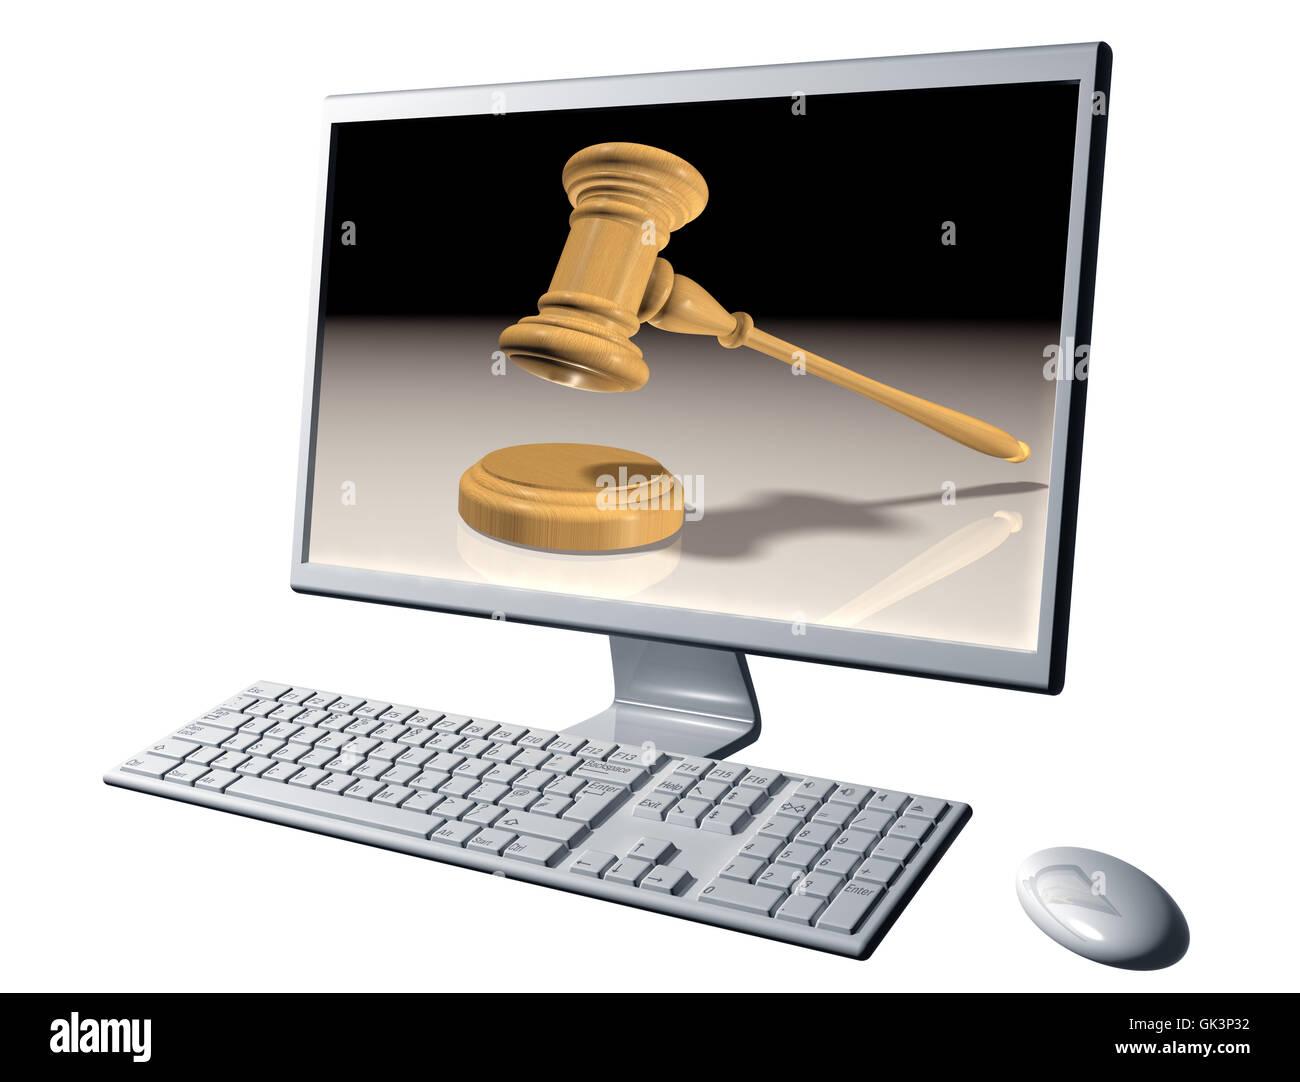 desktop auction bid - Stock Image